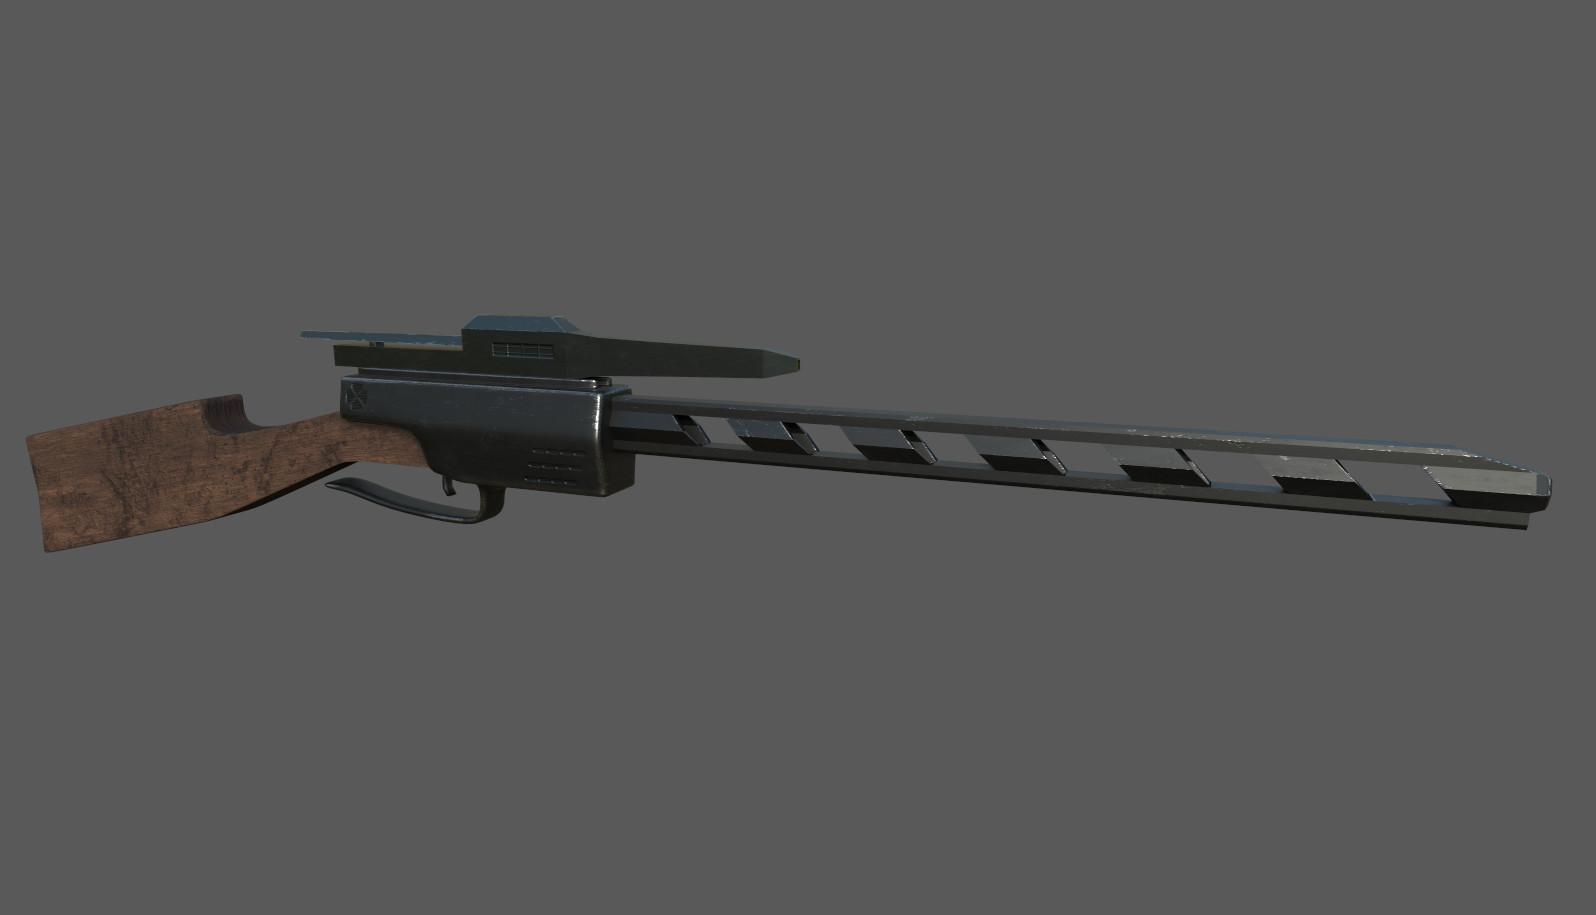 Projects >> Nick Edler - Futuristic Sniper Rifle